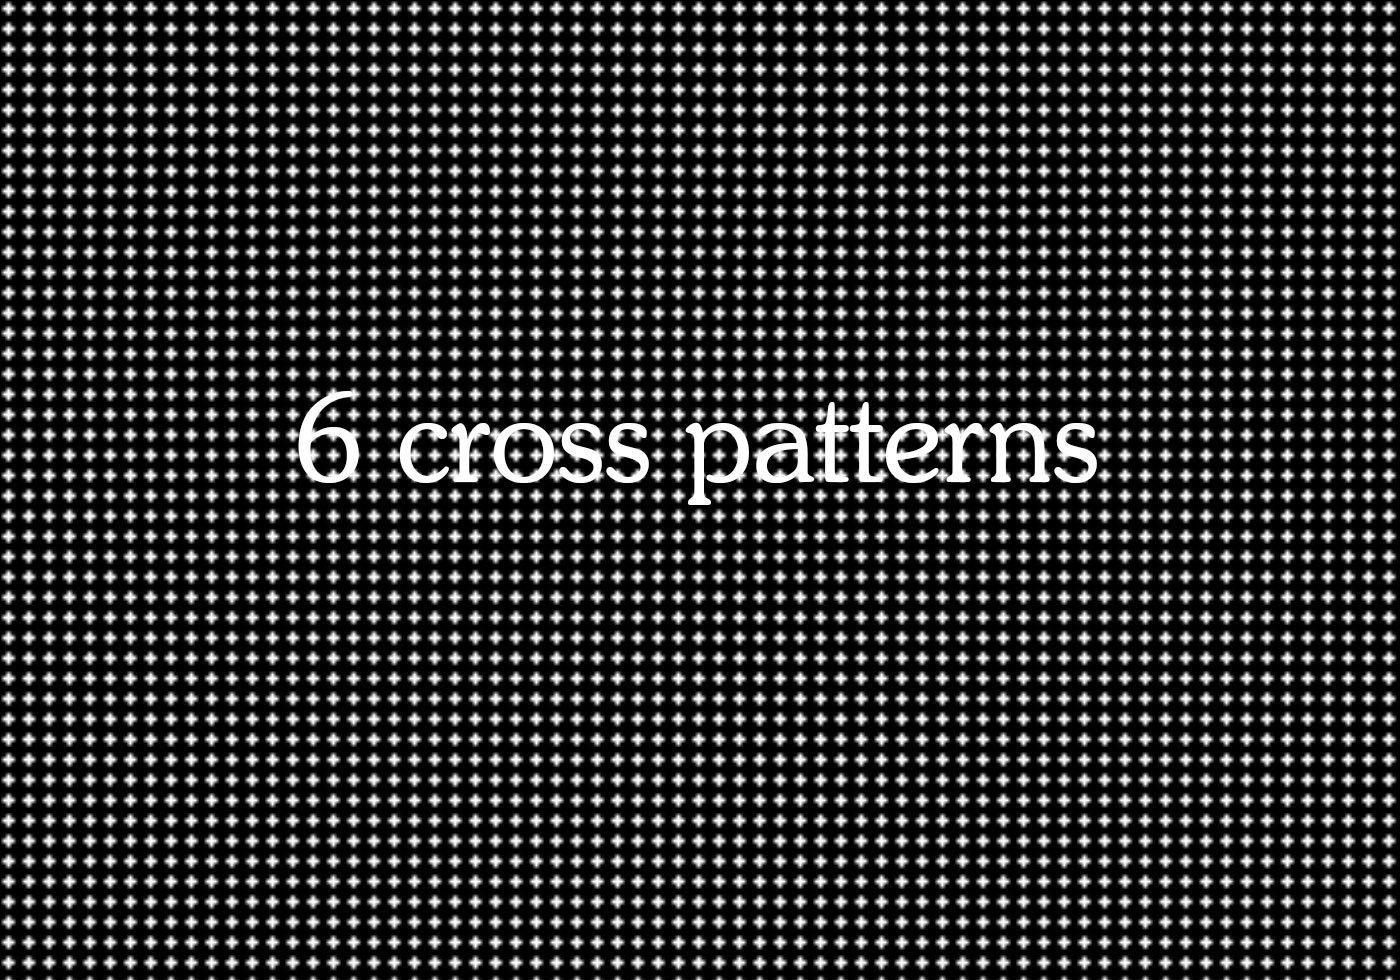 Free Cross Patterns